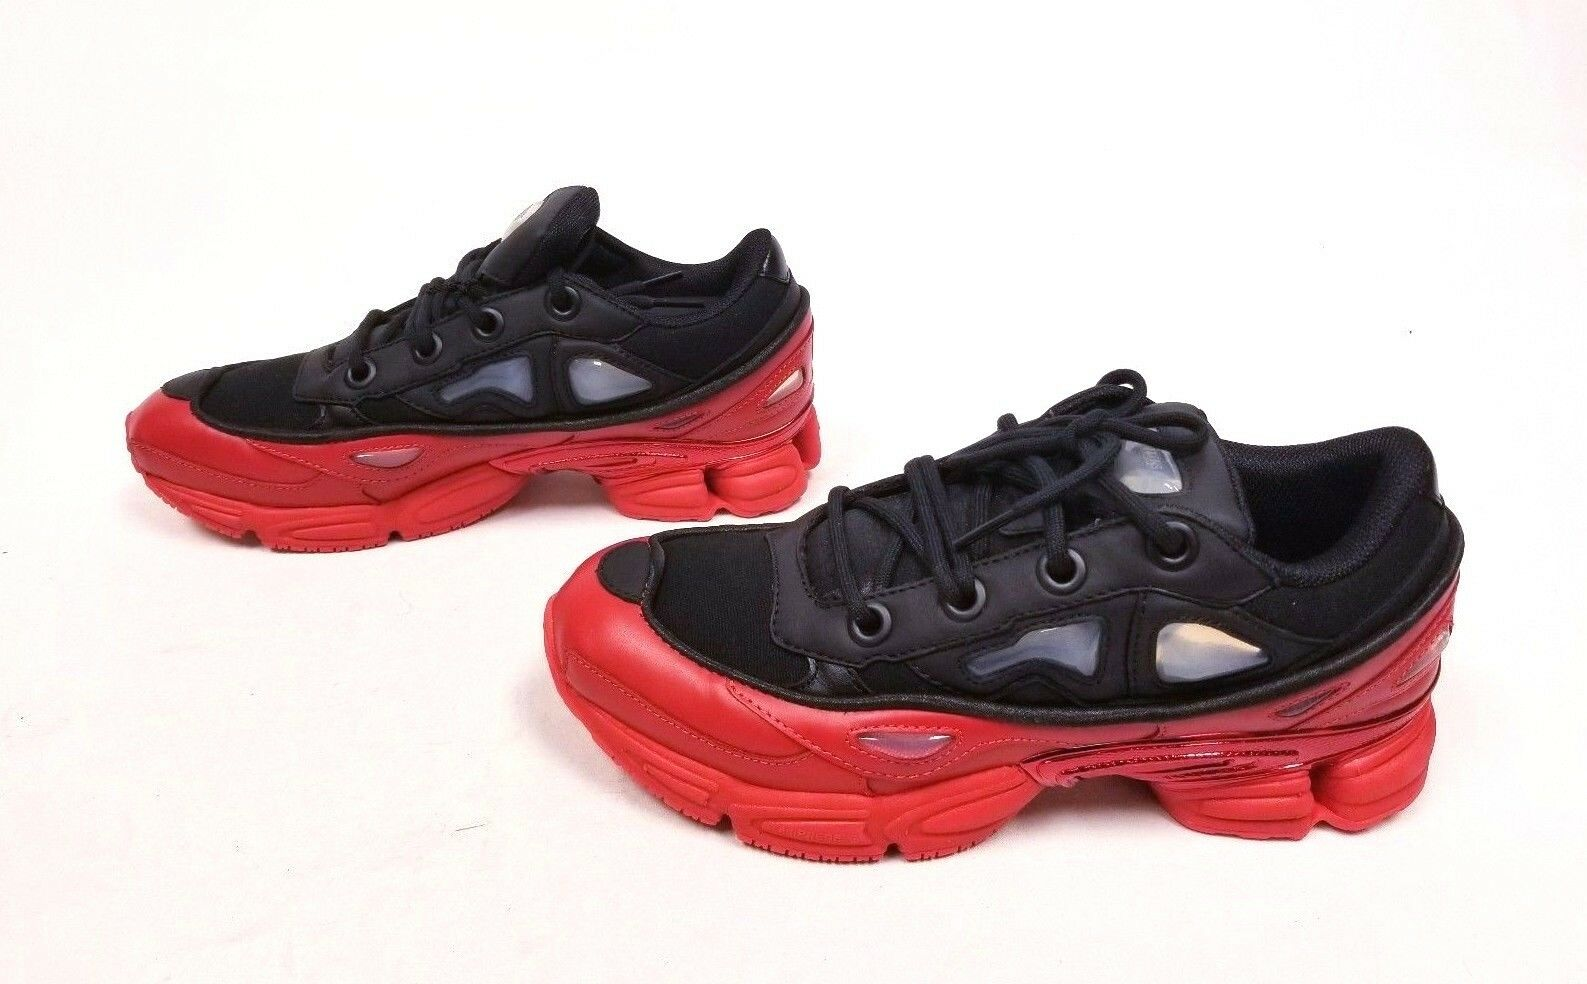 adidas x Raf Simons Men's Ozweego III Size Shoes GG8 Black/Scarlet DA8775 Size III 9.5 c784f2